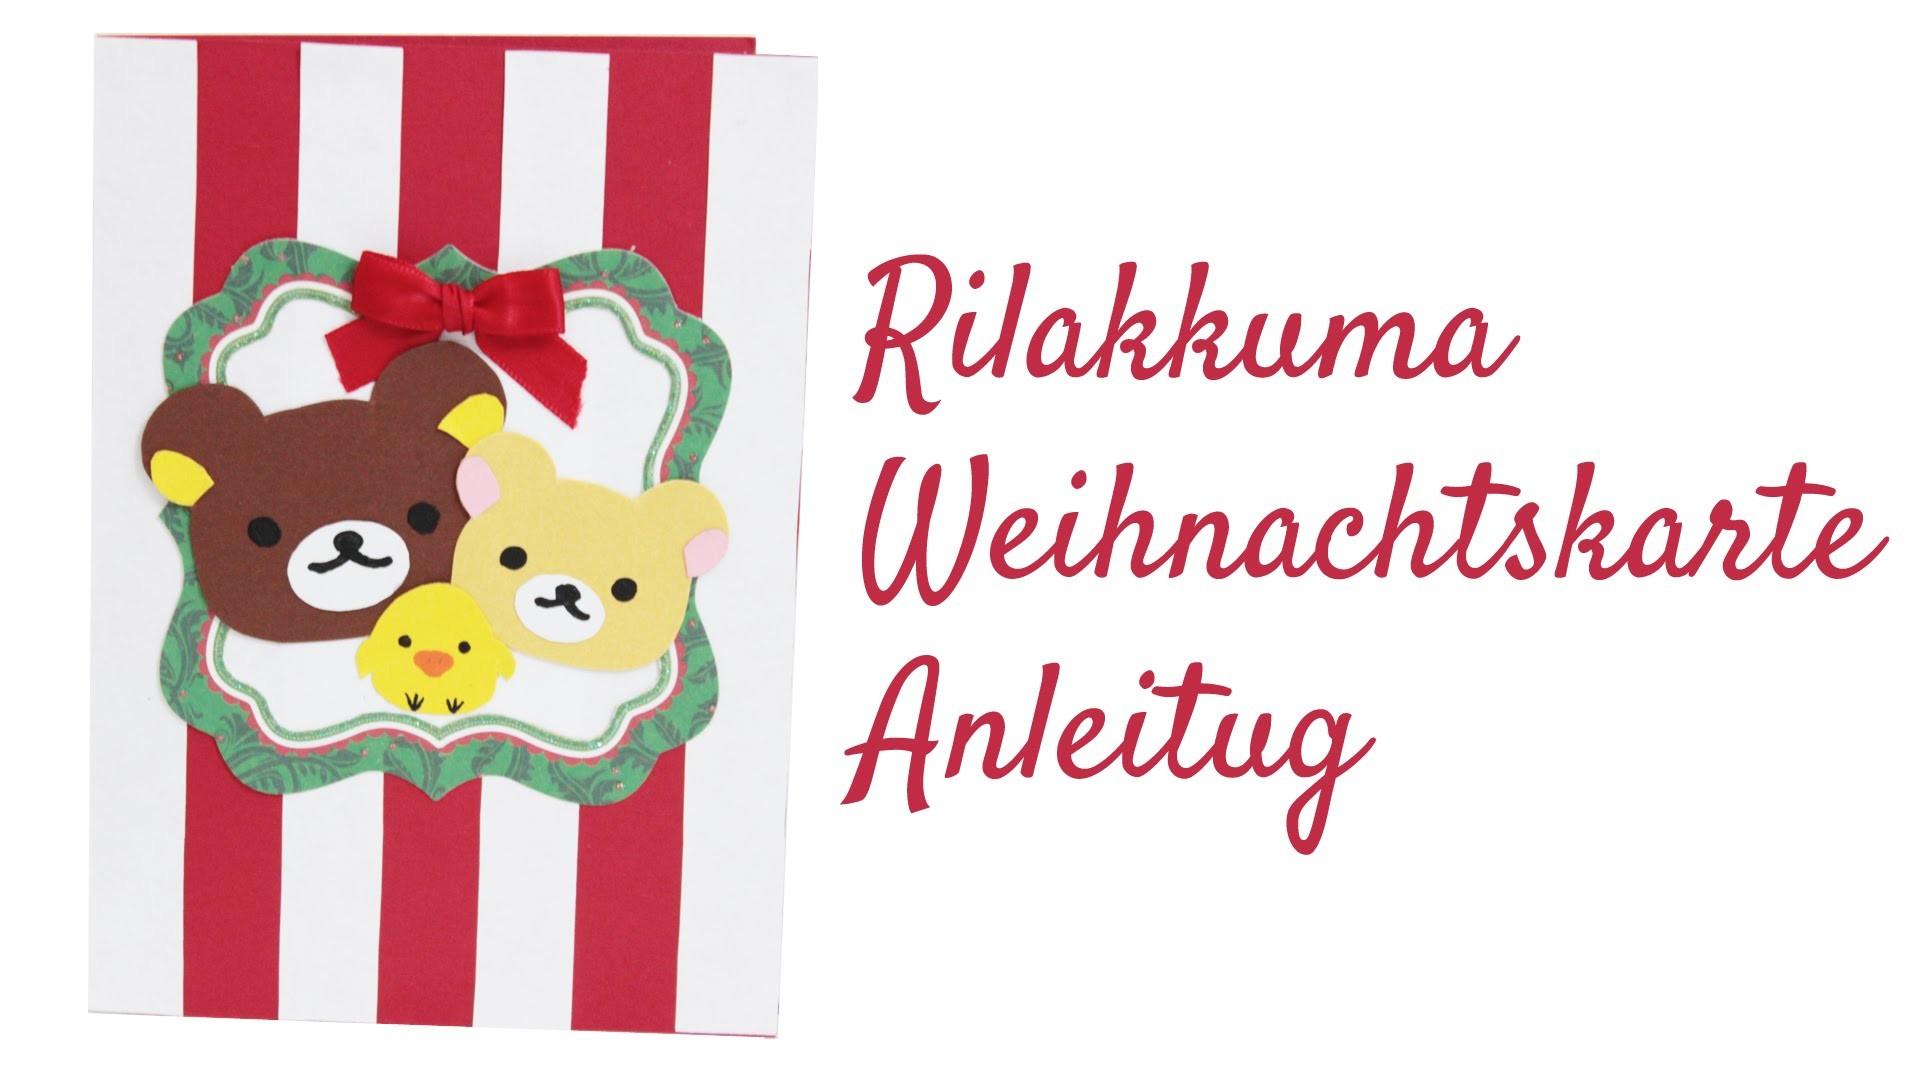 [Scrapbooking] Rilakkuma Weihnachtskarte basteln   Koop mit Mylittle Miniworld